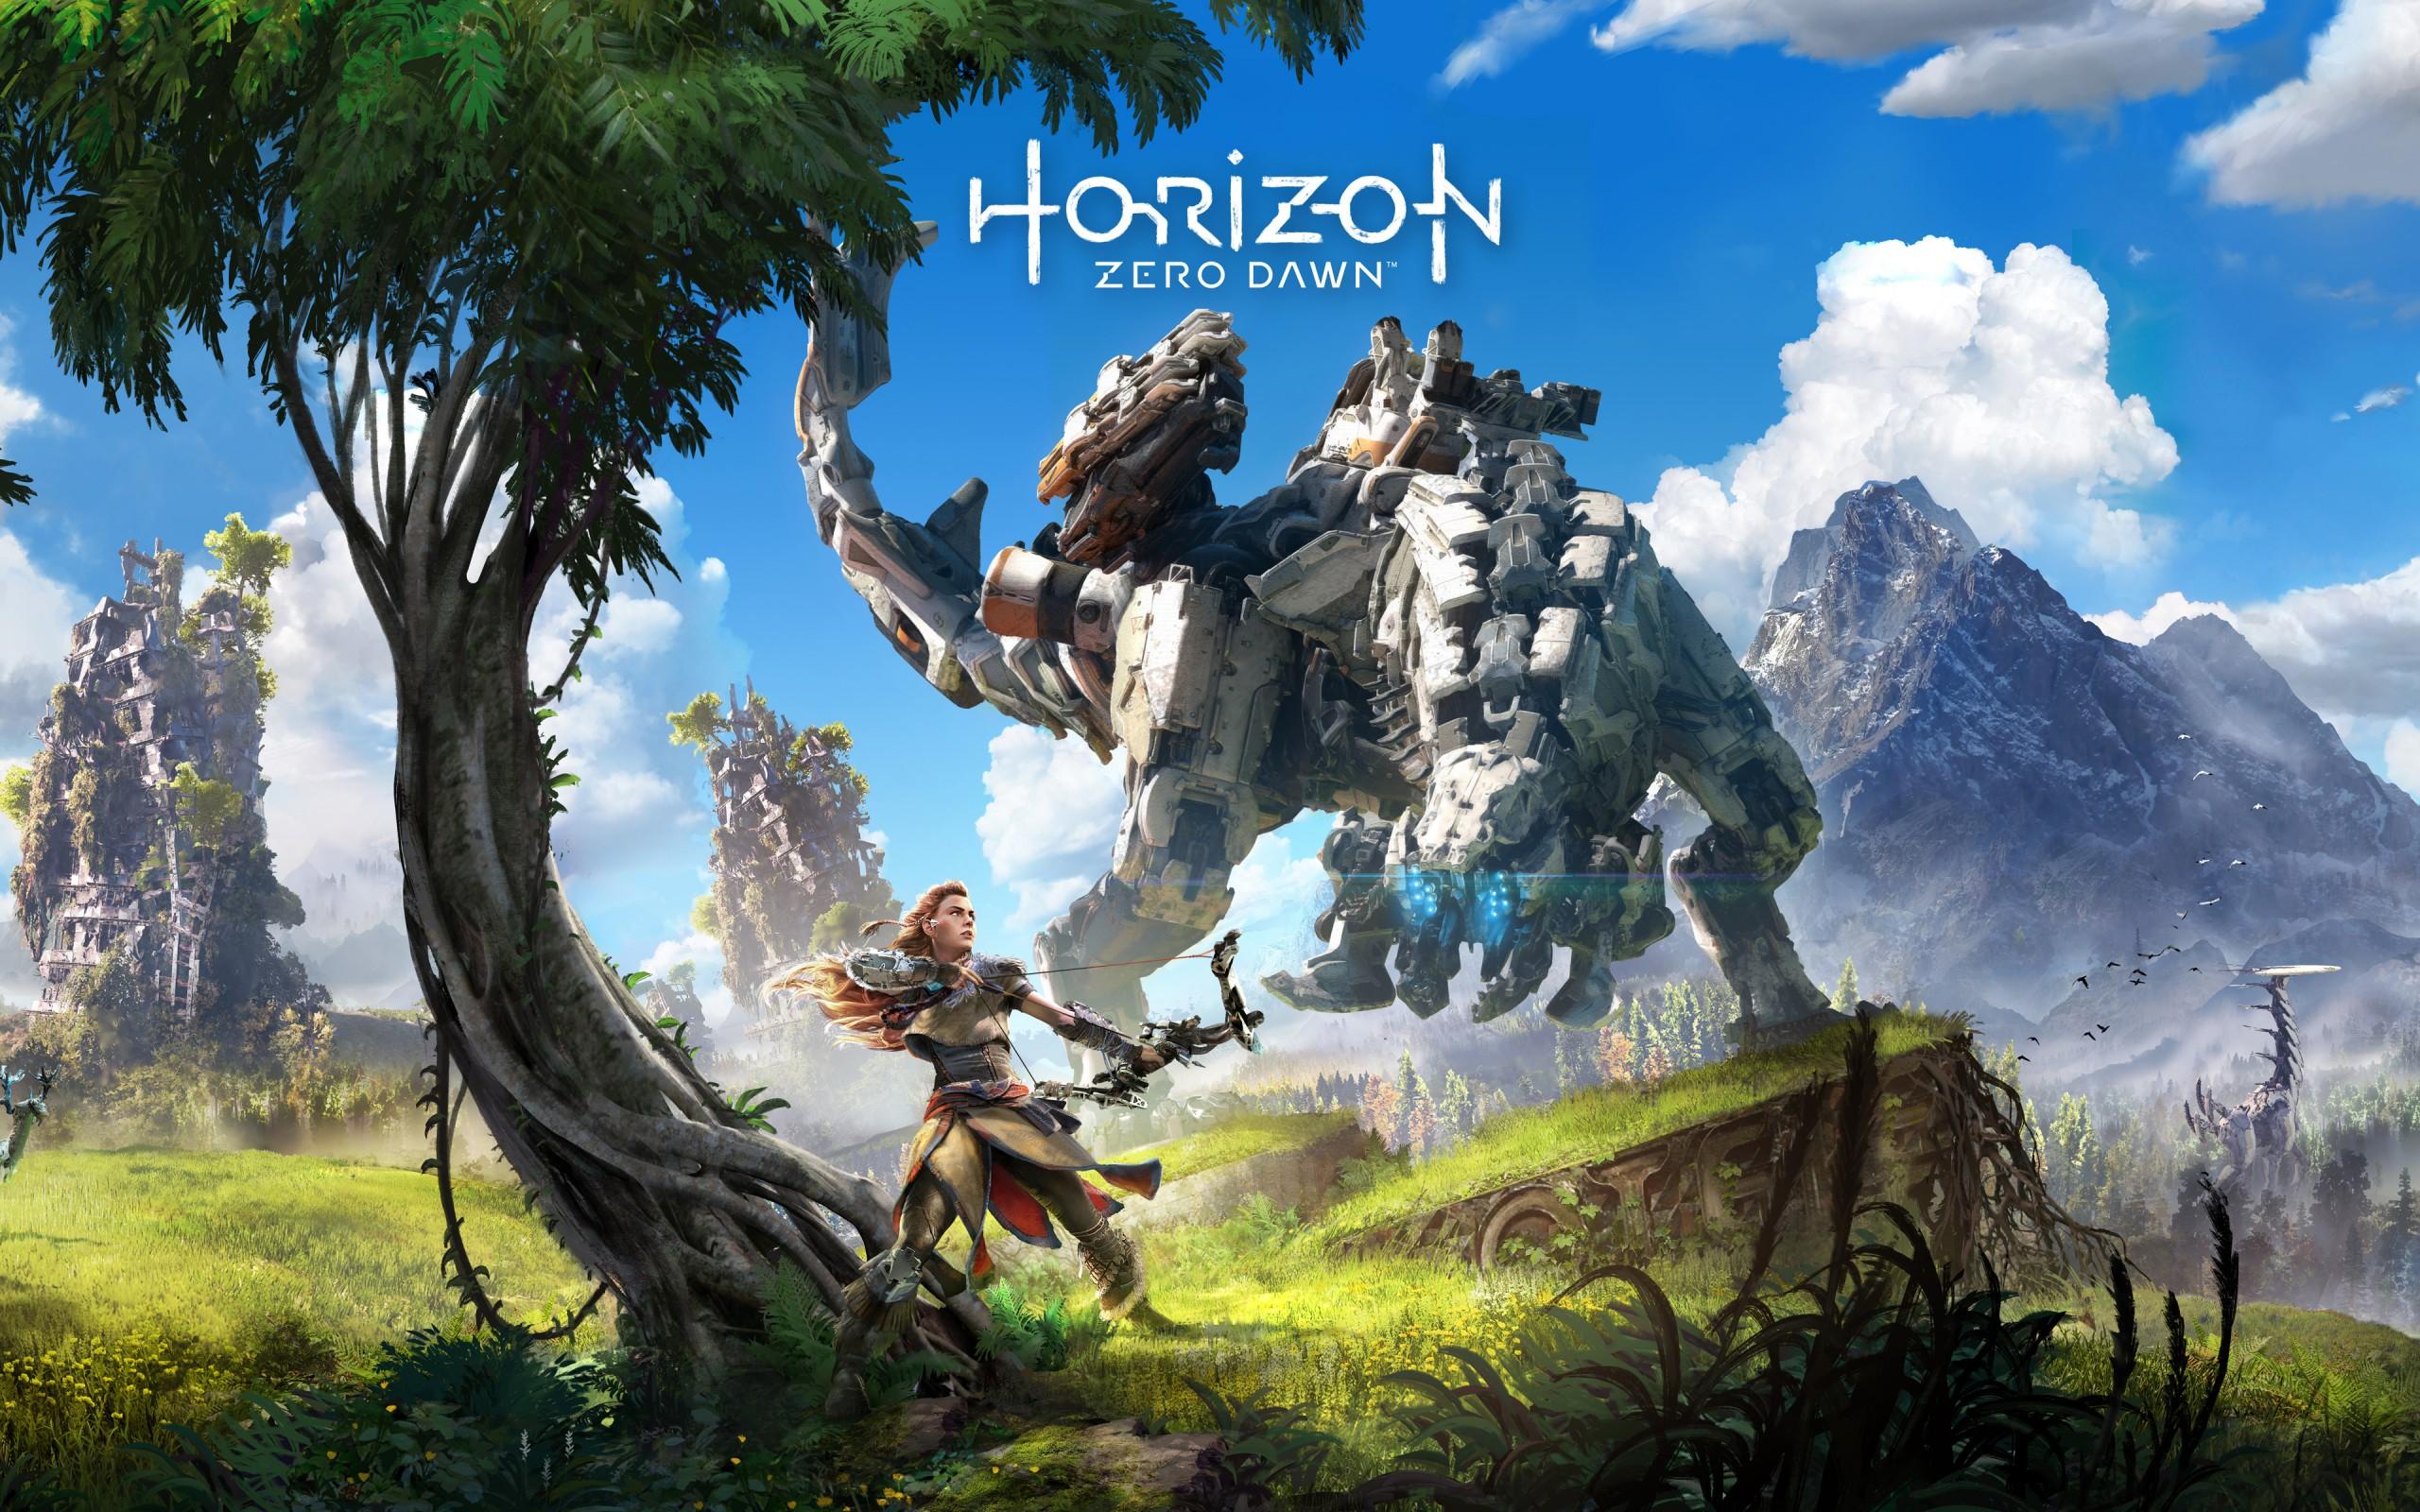 Kratos Wallpaper Hd 3d Horizon Zero Dawn 4k 8k Wallpapers Hd Wallpapers Id 20361